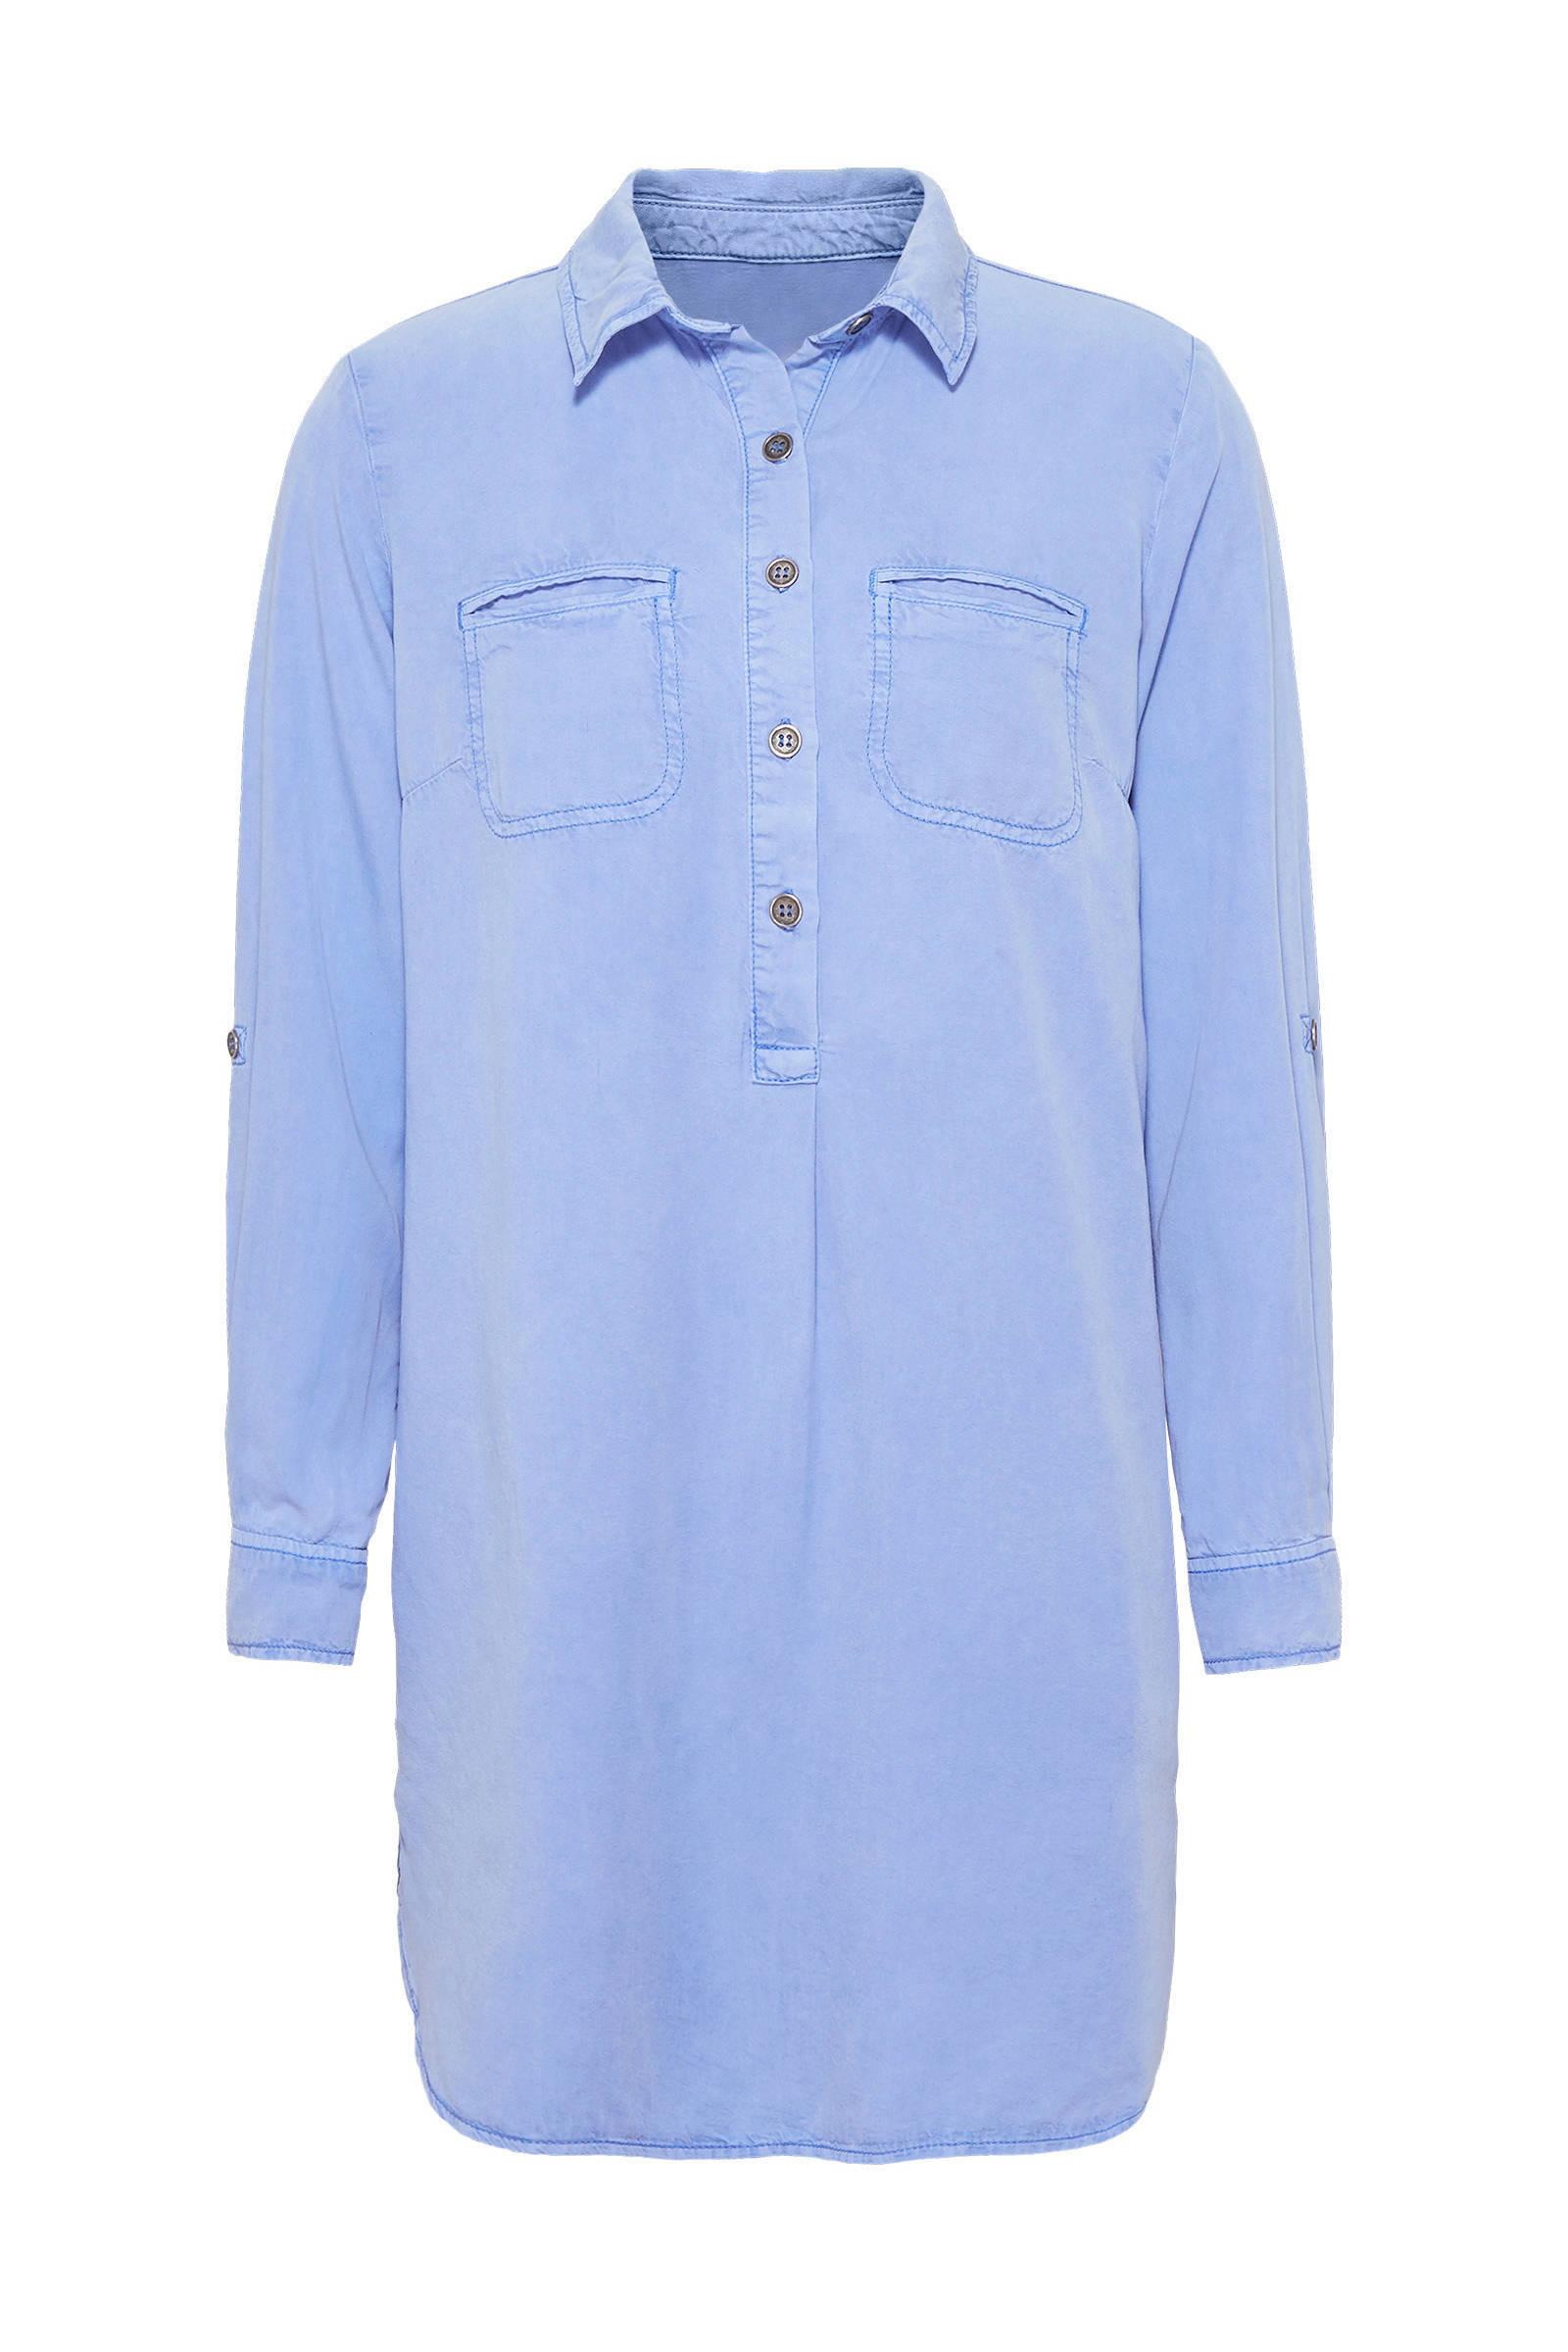 4d42f246883feb topsamp  bij DIDI wehkamp Gratis vanaf 20 blouses bezorging f7gyb6